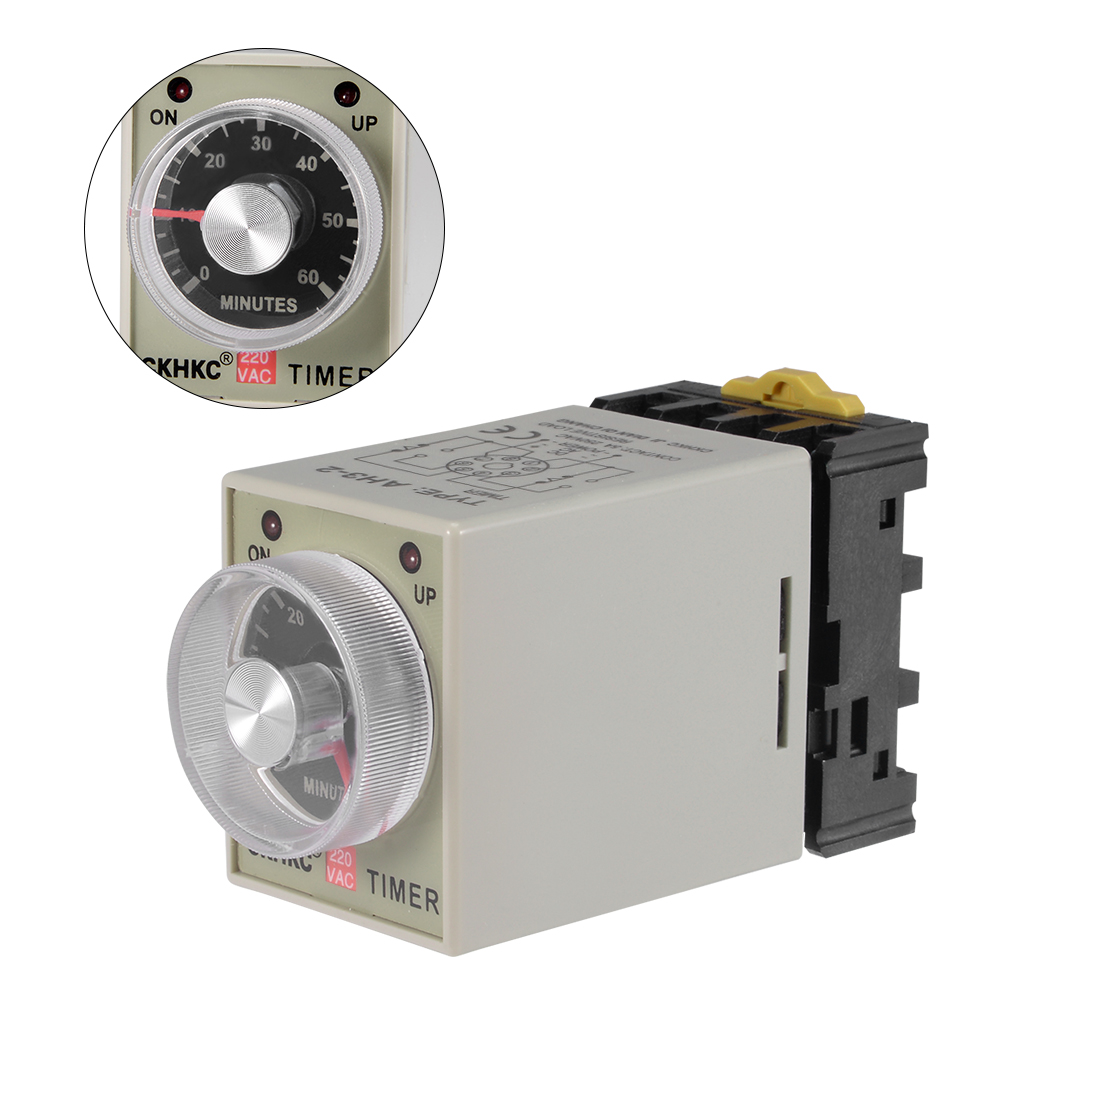 AC220V 60M 8 Terminals Range Adjustable Delay Timer Time Relay AH3-2